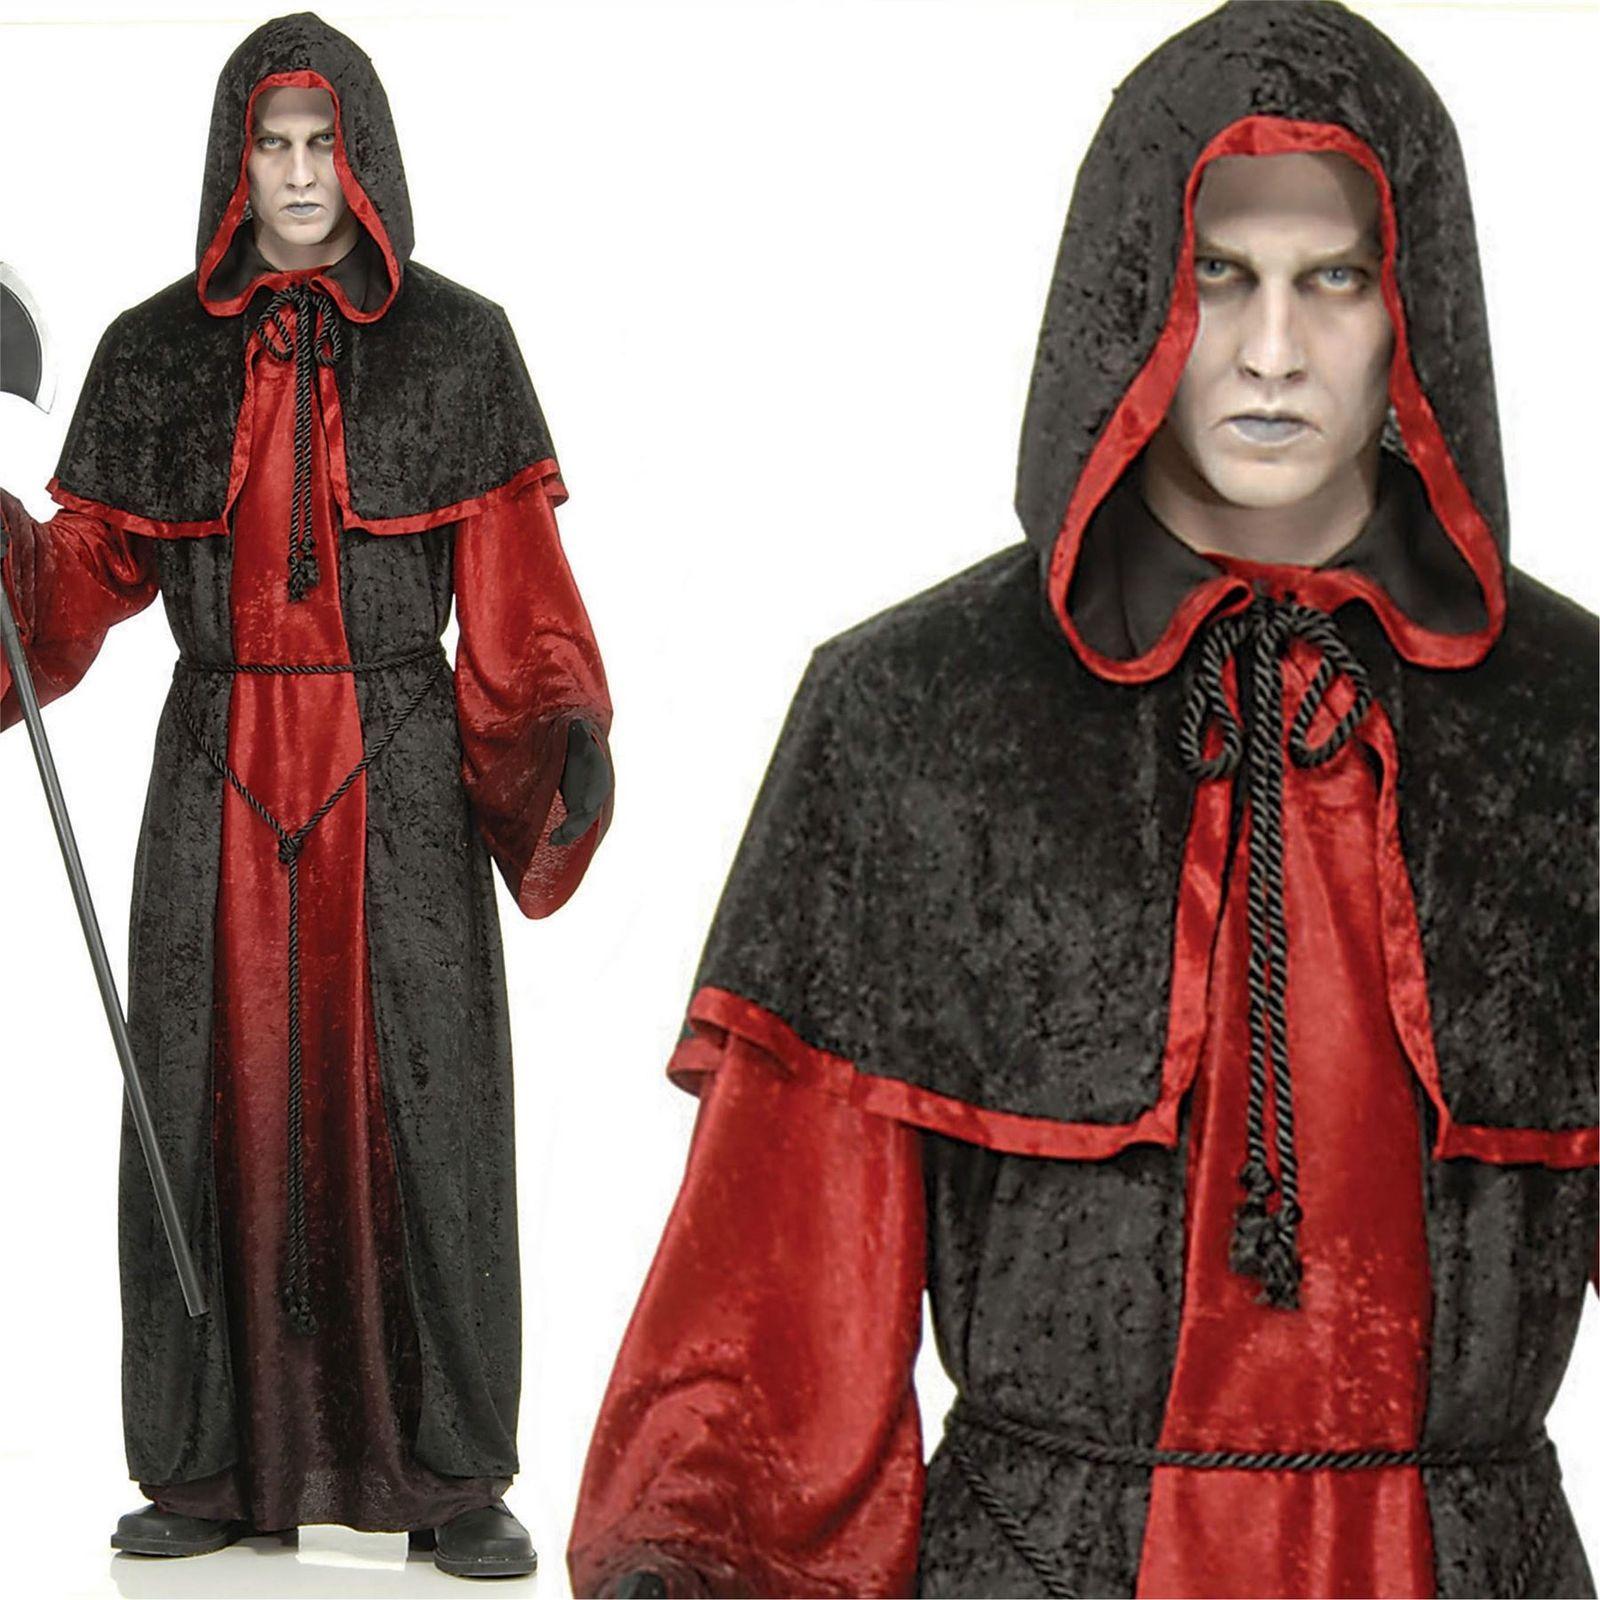 Gugel Brown Monk Hood Gugl Headpiece Shoulders Gugeln Schulterumhang